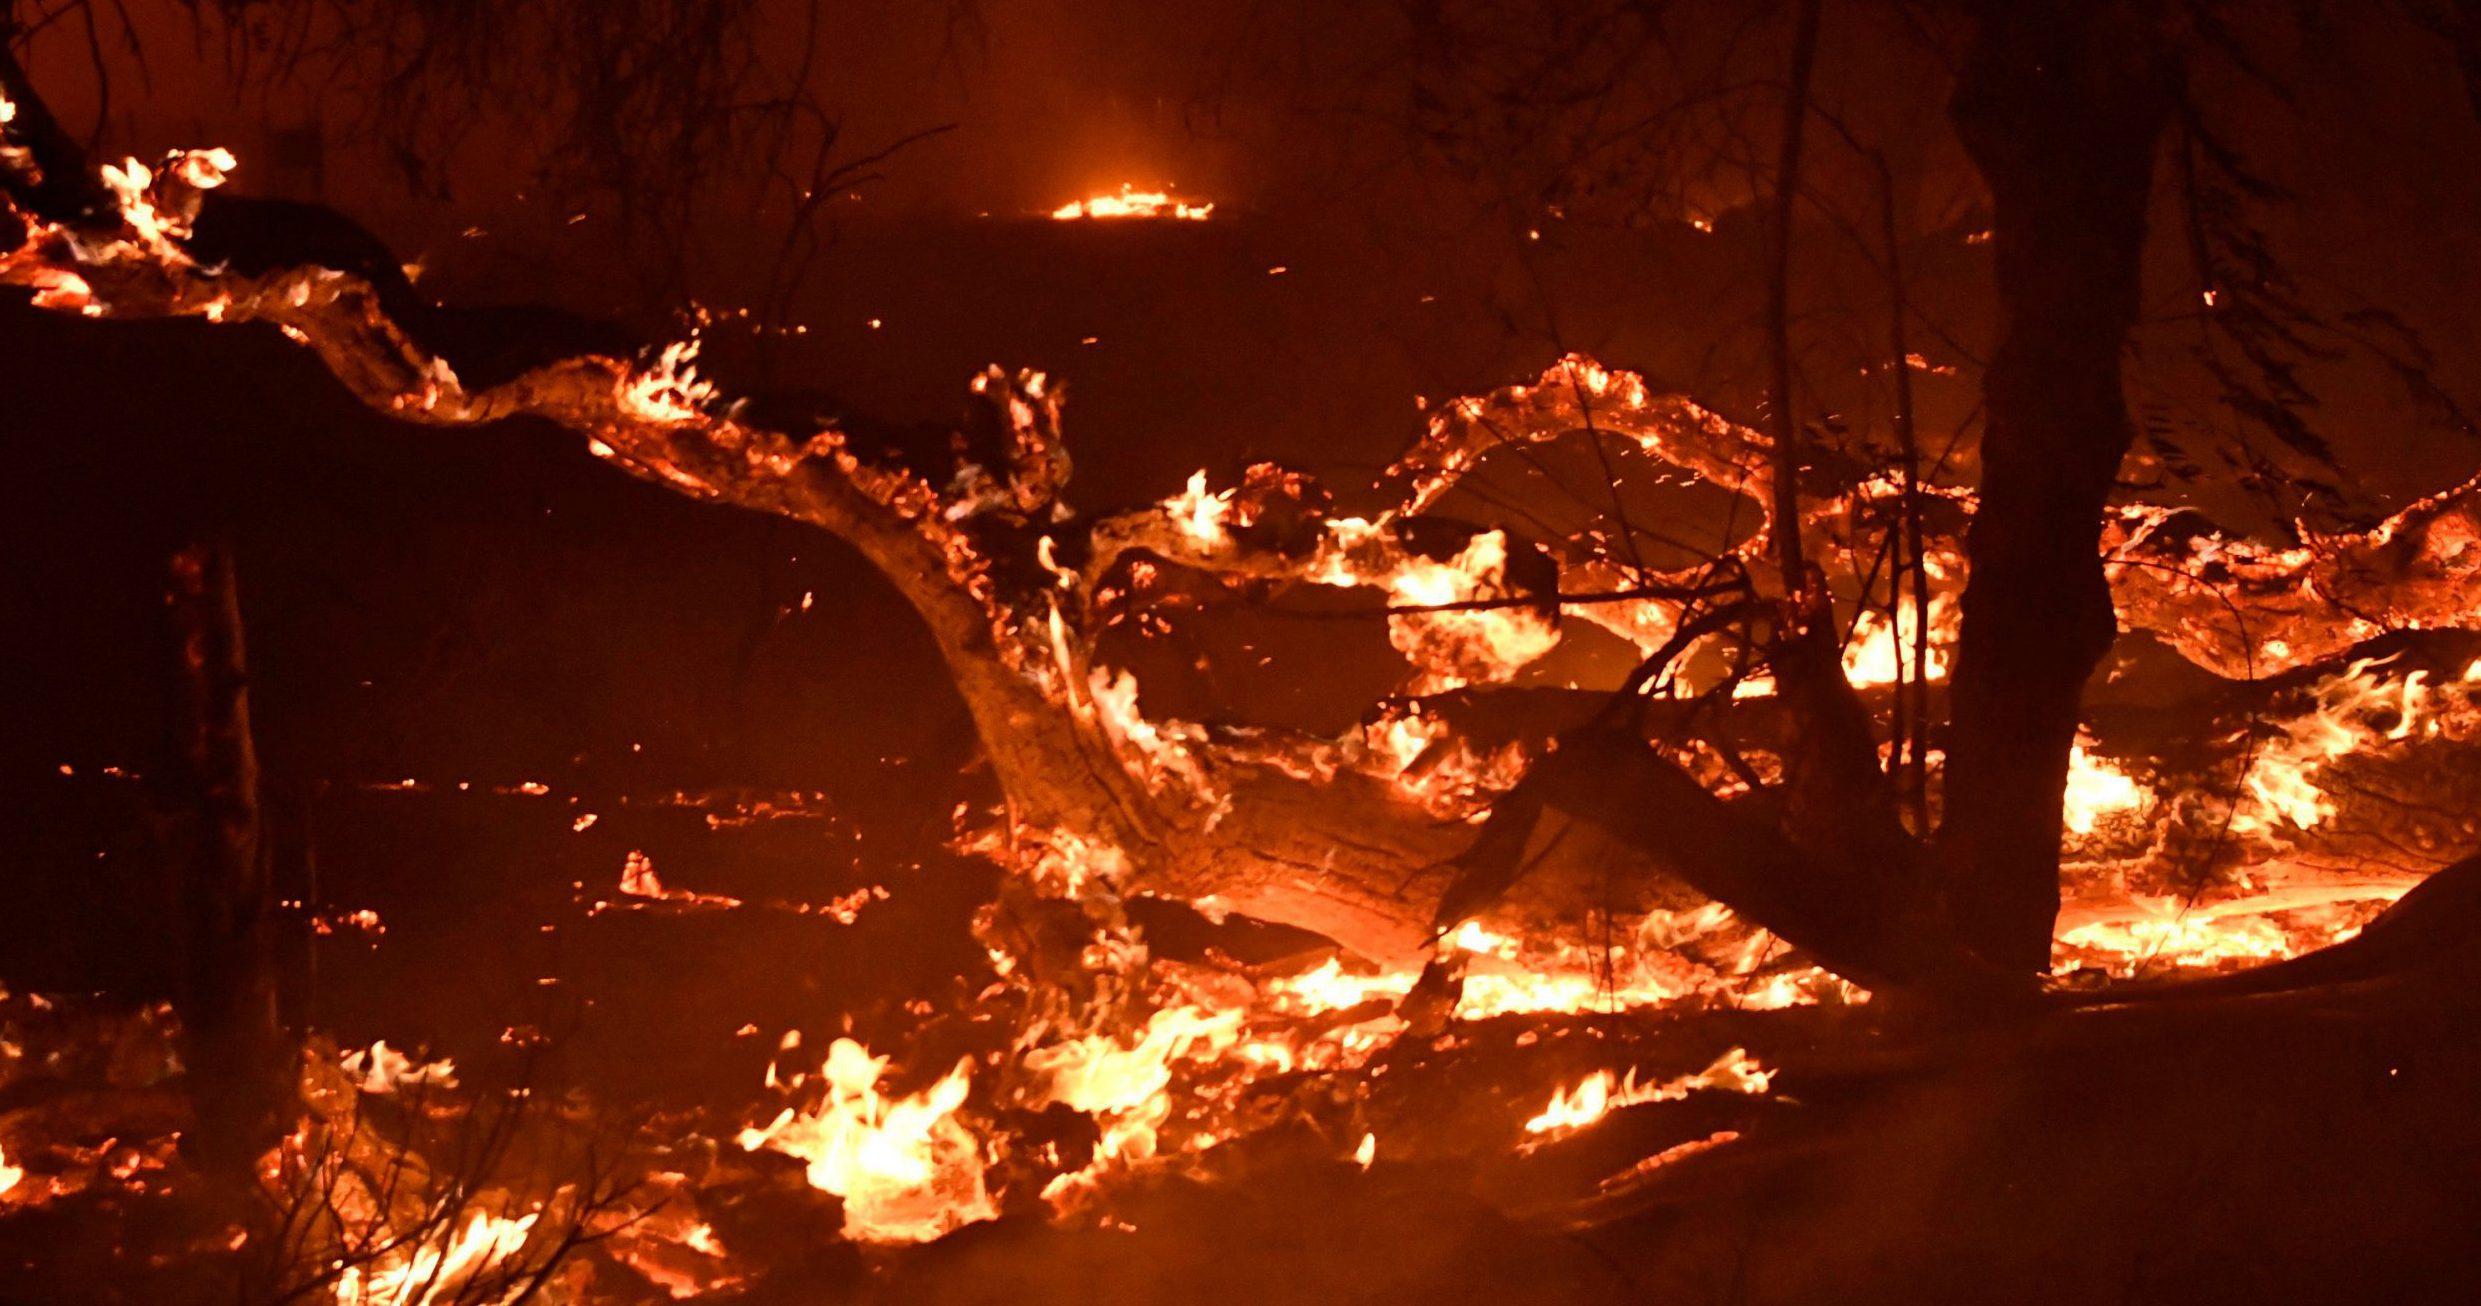 Mandatory Credit: Photo by Gene Blevins/ZUMA Wire/REX (9972377c) Overnight firefighters battle the Santa Rosa fire Thursday night into Friday morning California Wildfires, Oak Park, USA - 08 Nov 2018